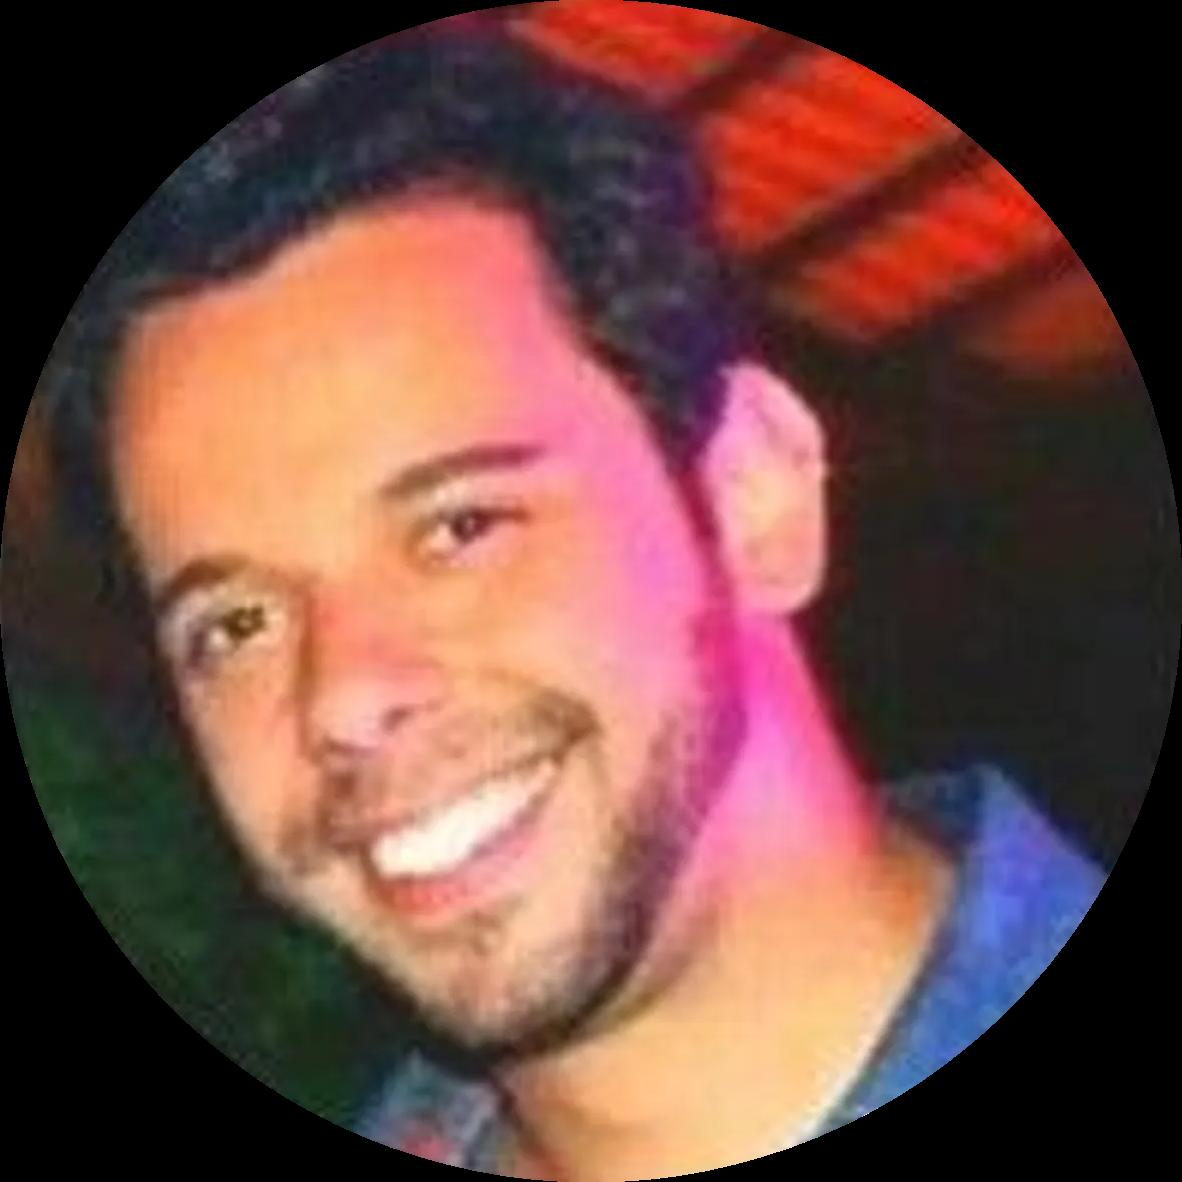 Luiz Chiqueto – Brazilian Site Manager